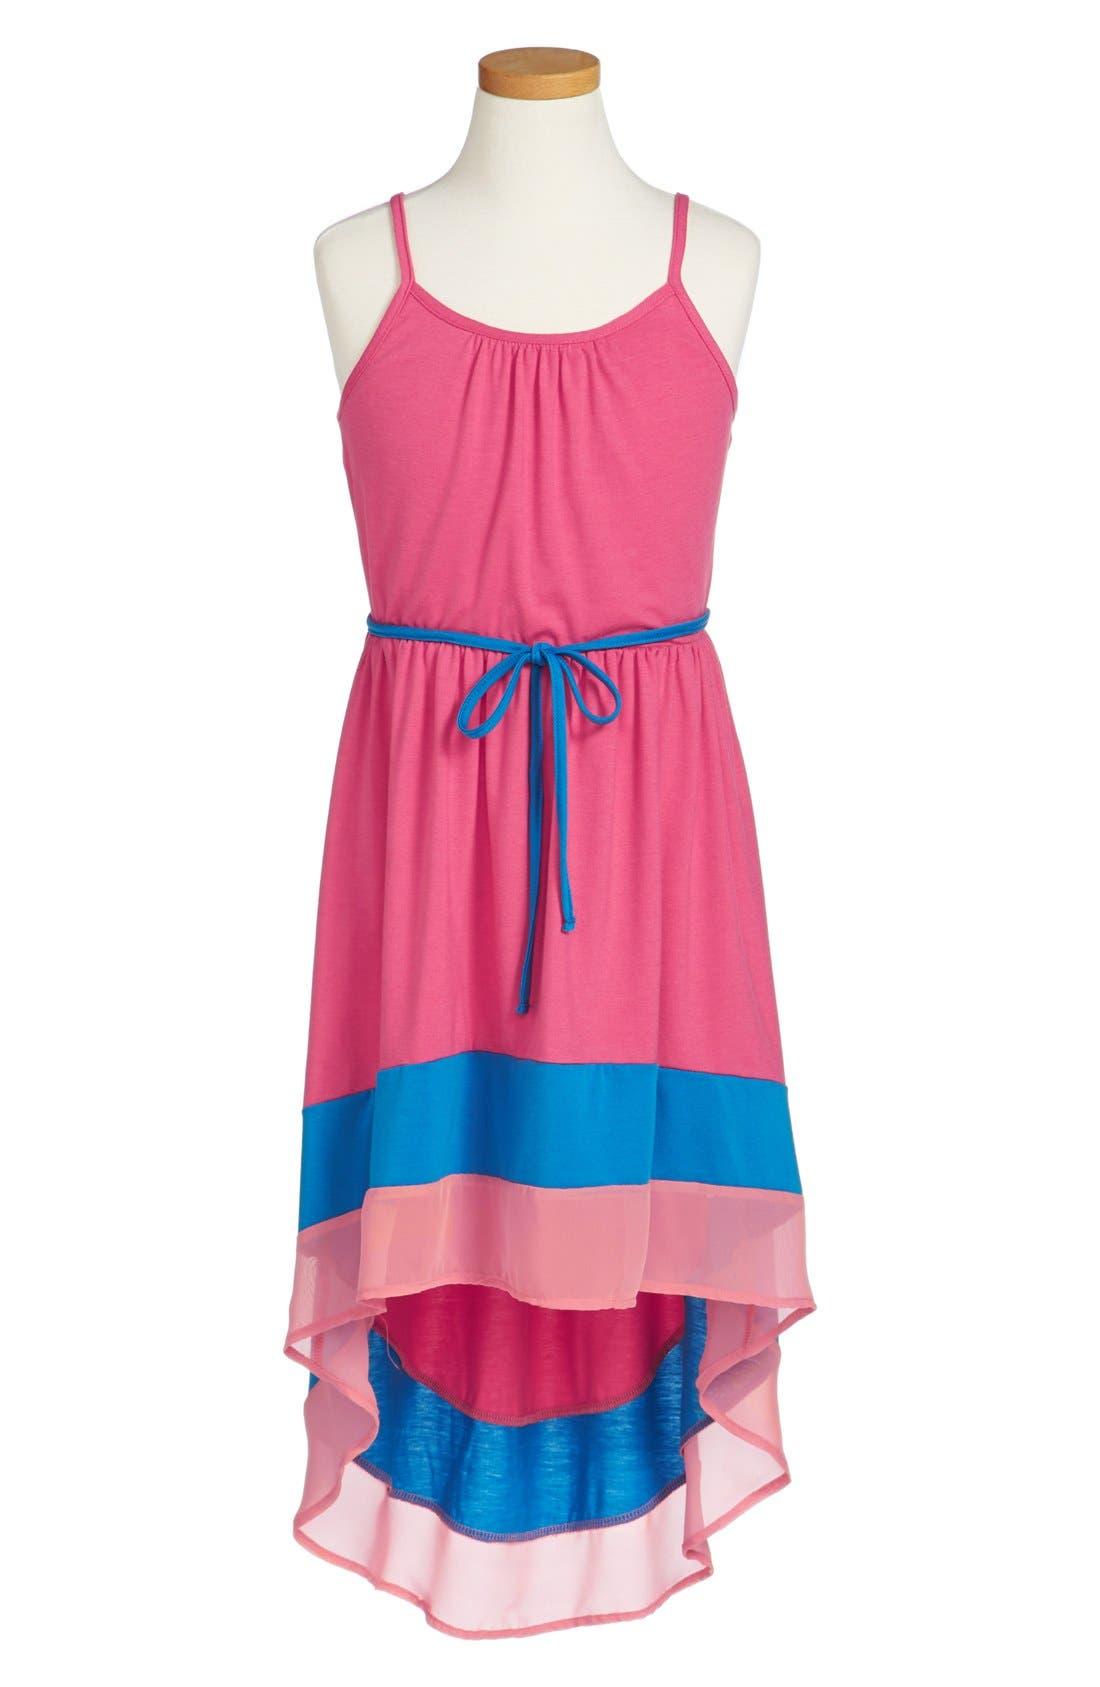 Alternate Image 1 Selected - Zunie Colorblock High/Low Dress (Big Girls)